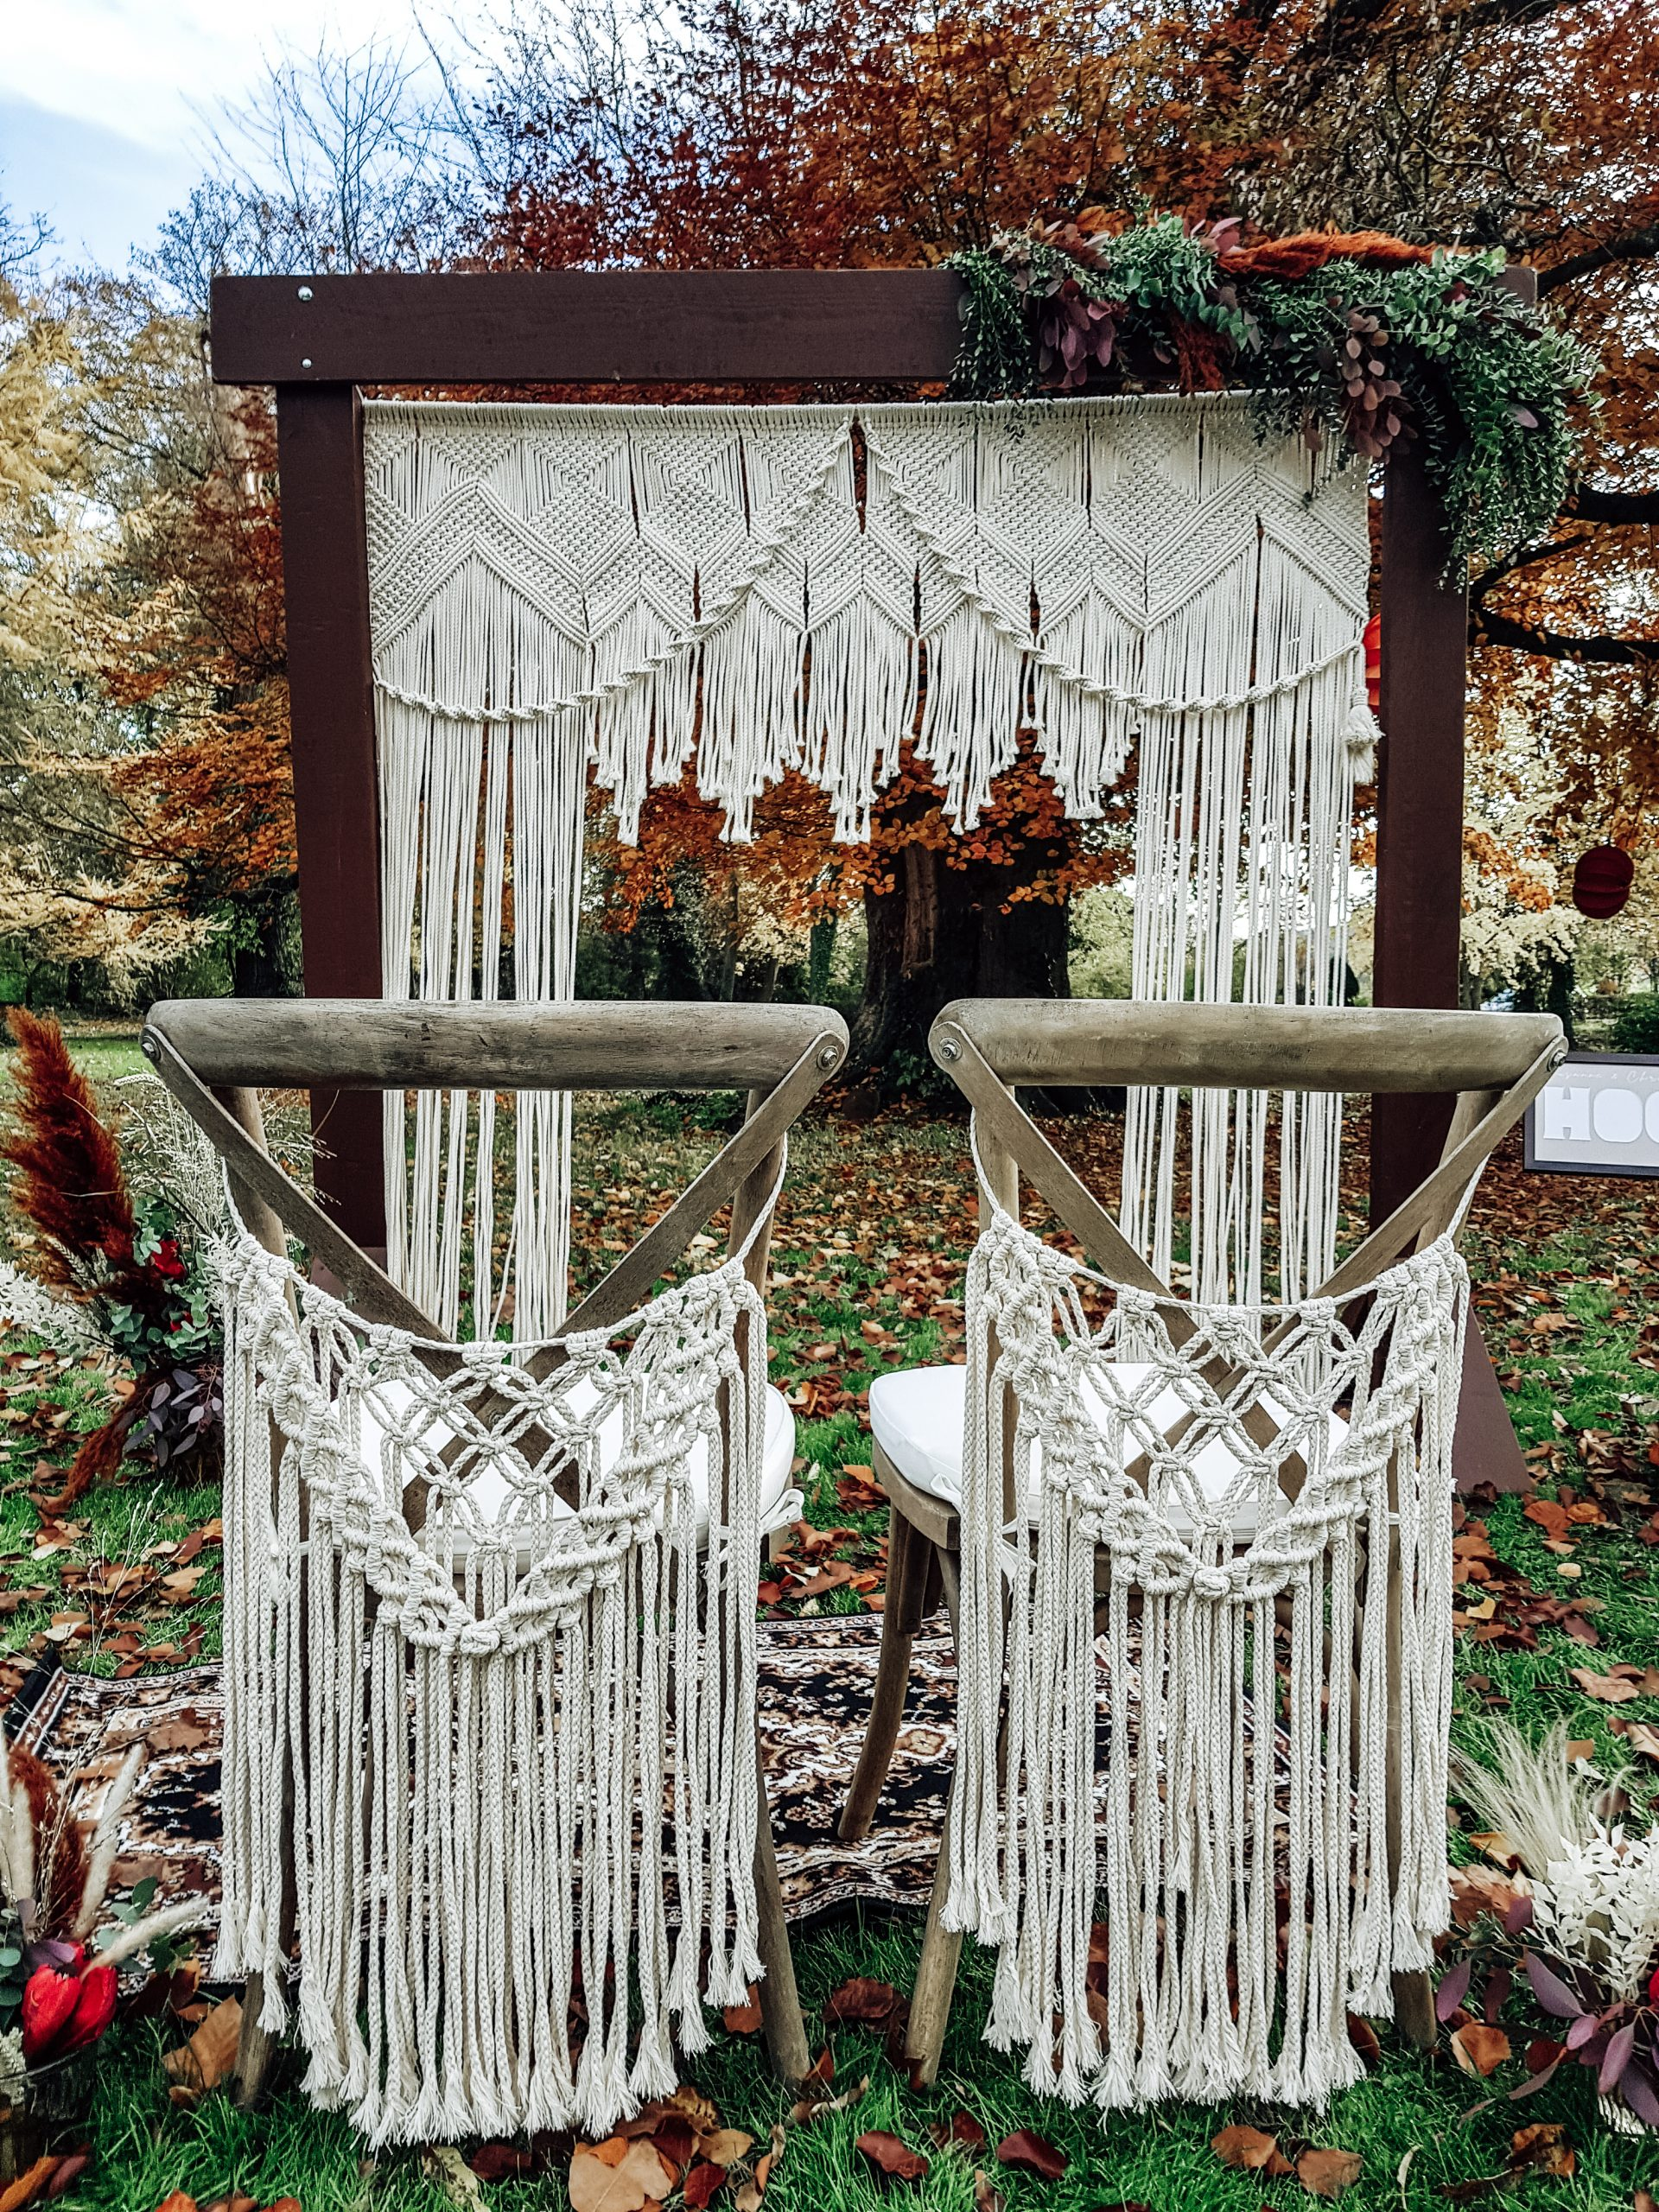 Crossback Stühle mieten bei Love Events